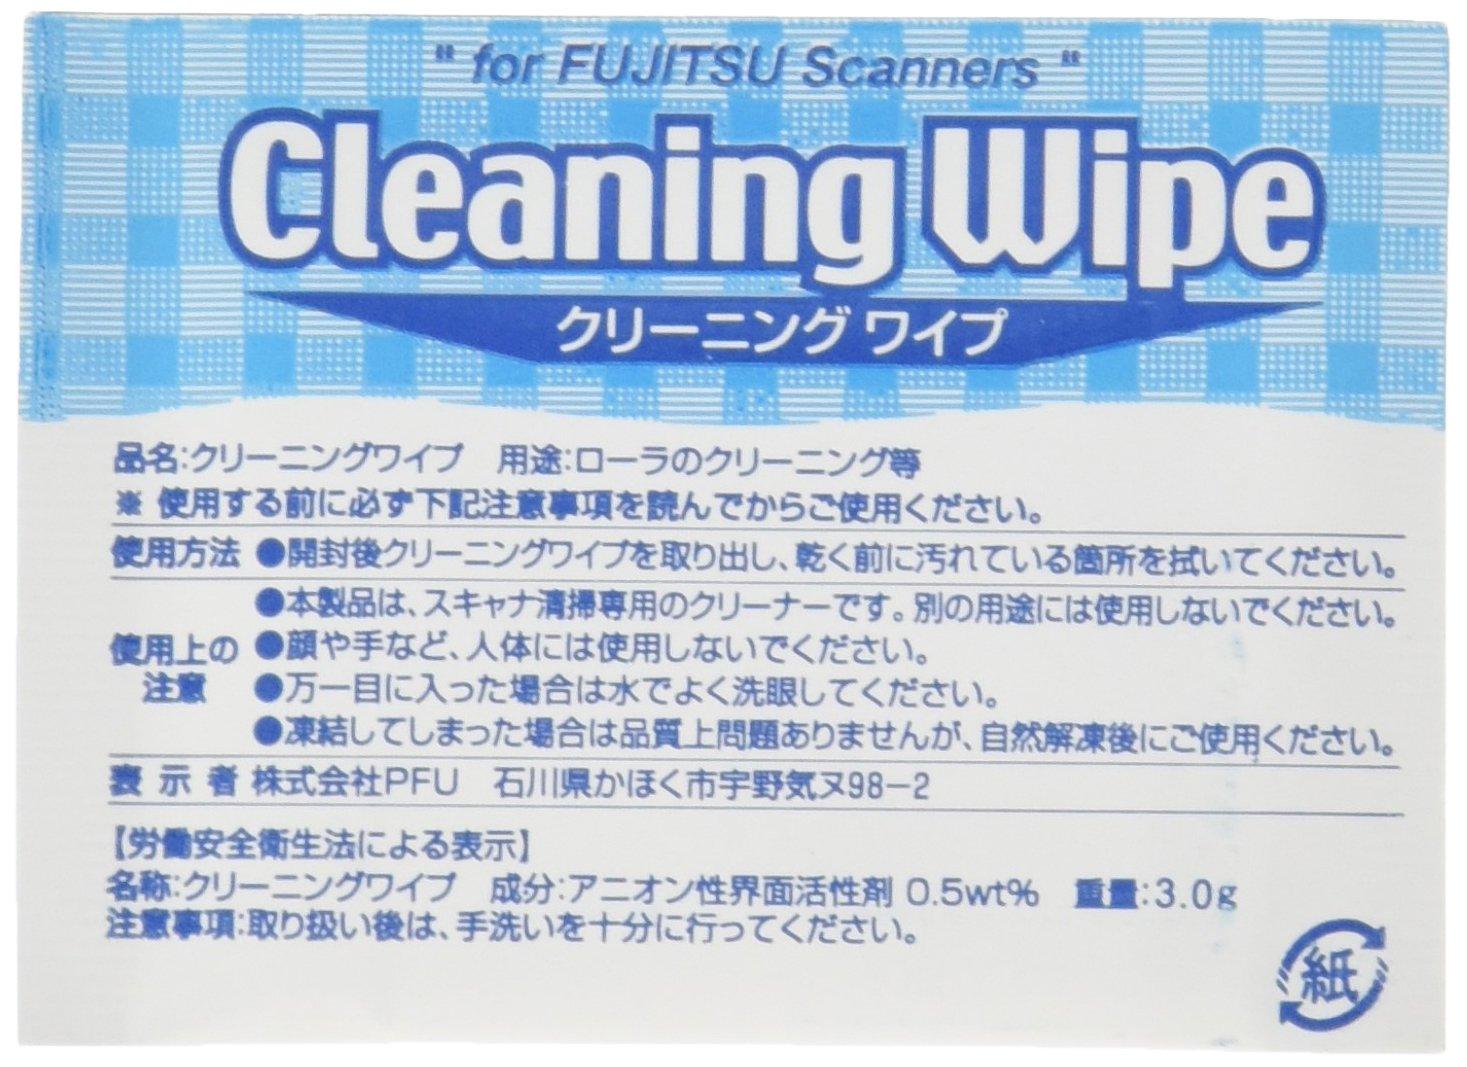 fujitsu split system remote control manual